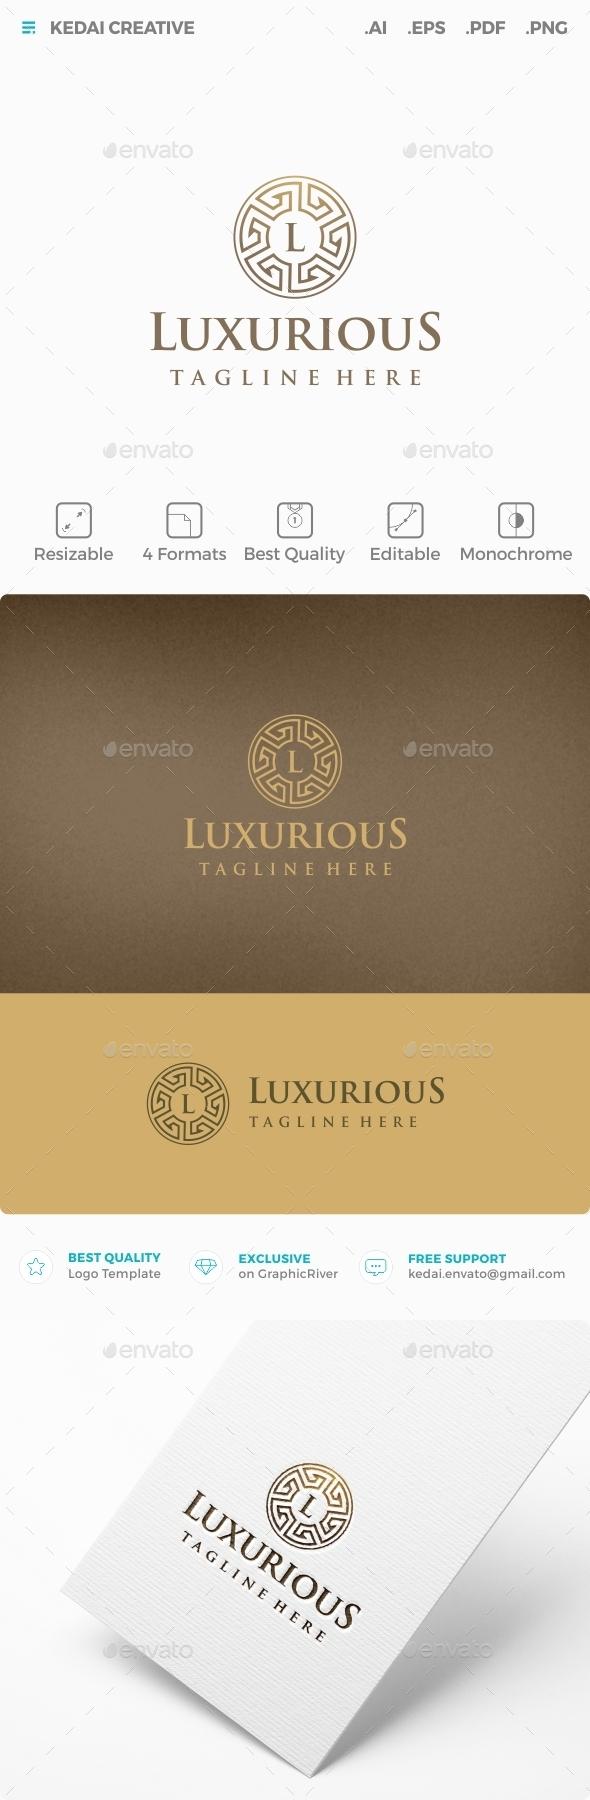 Luxurious - Symbols Logo Templates